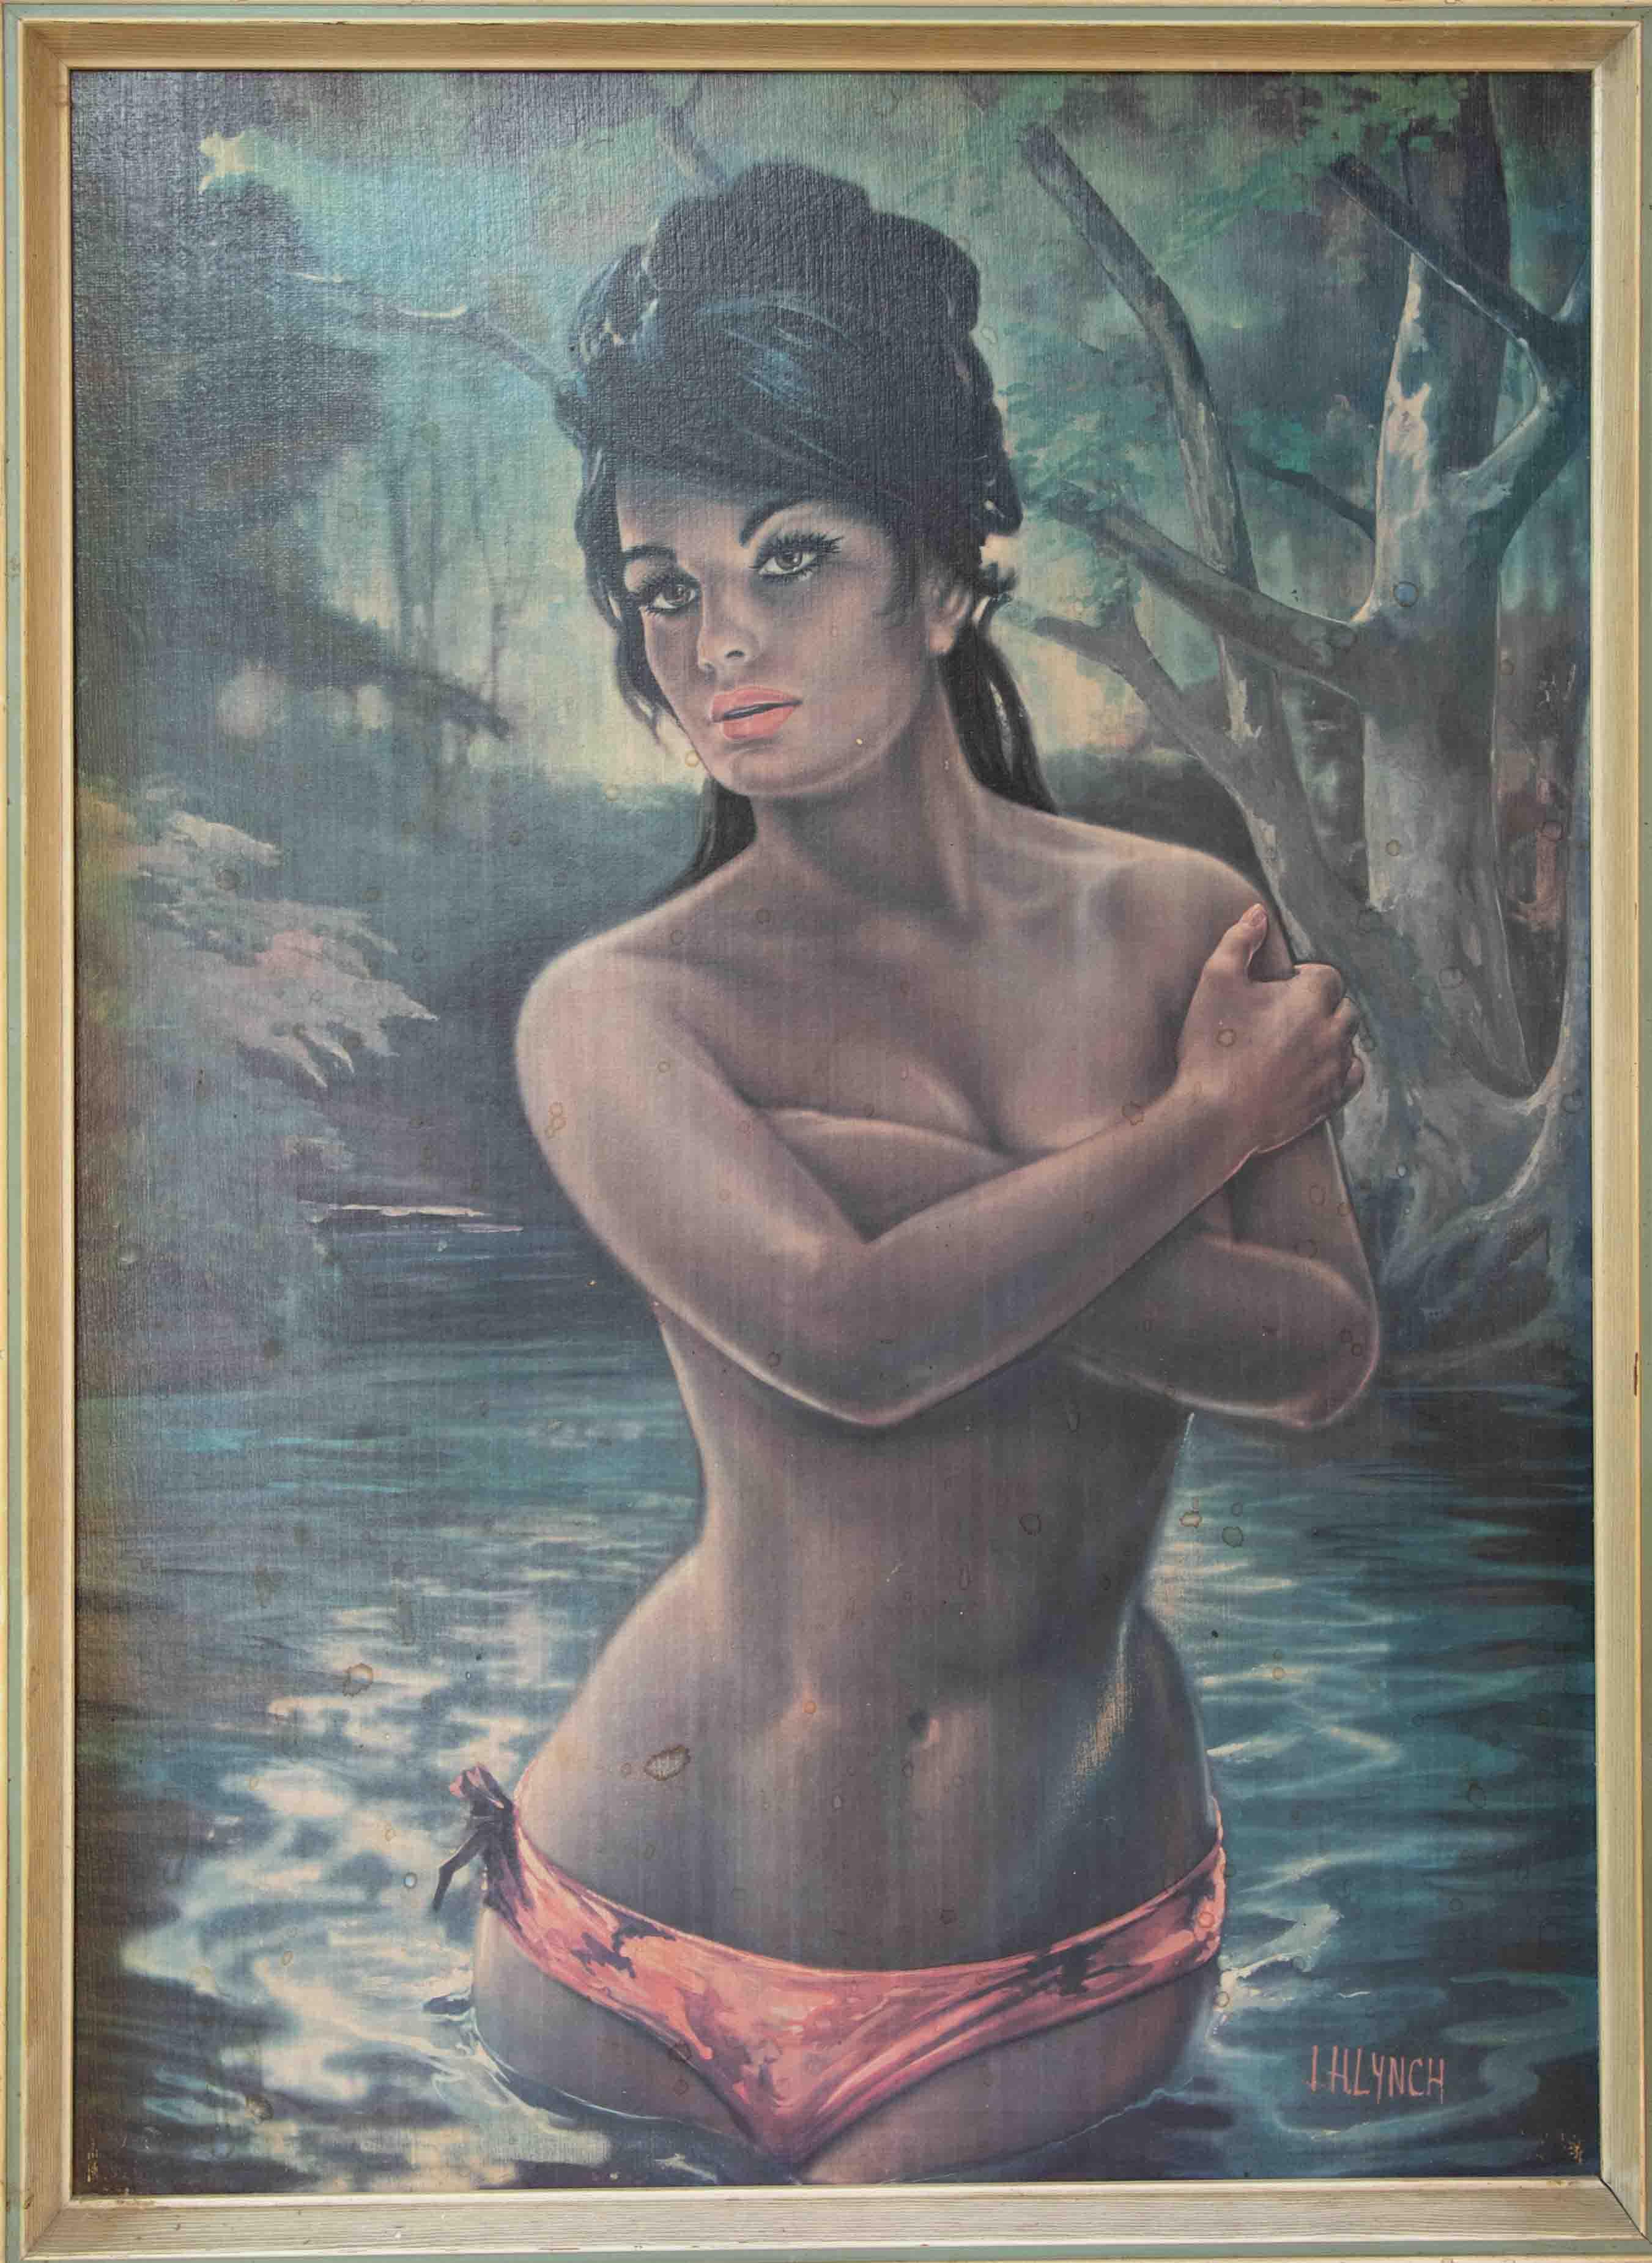 J.Lynch, 'Nymph' print, 68cm x 49cm, framed.